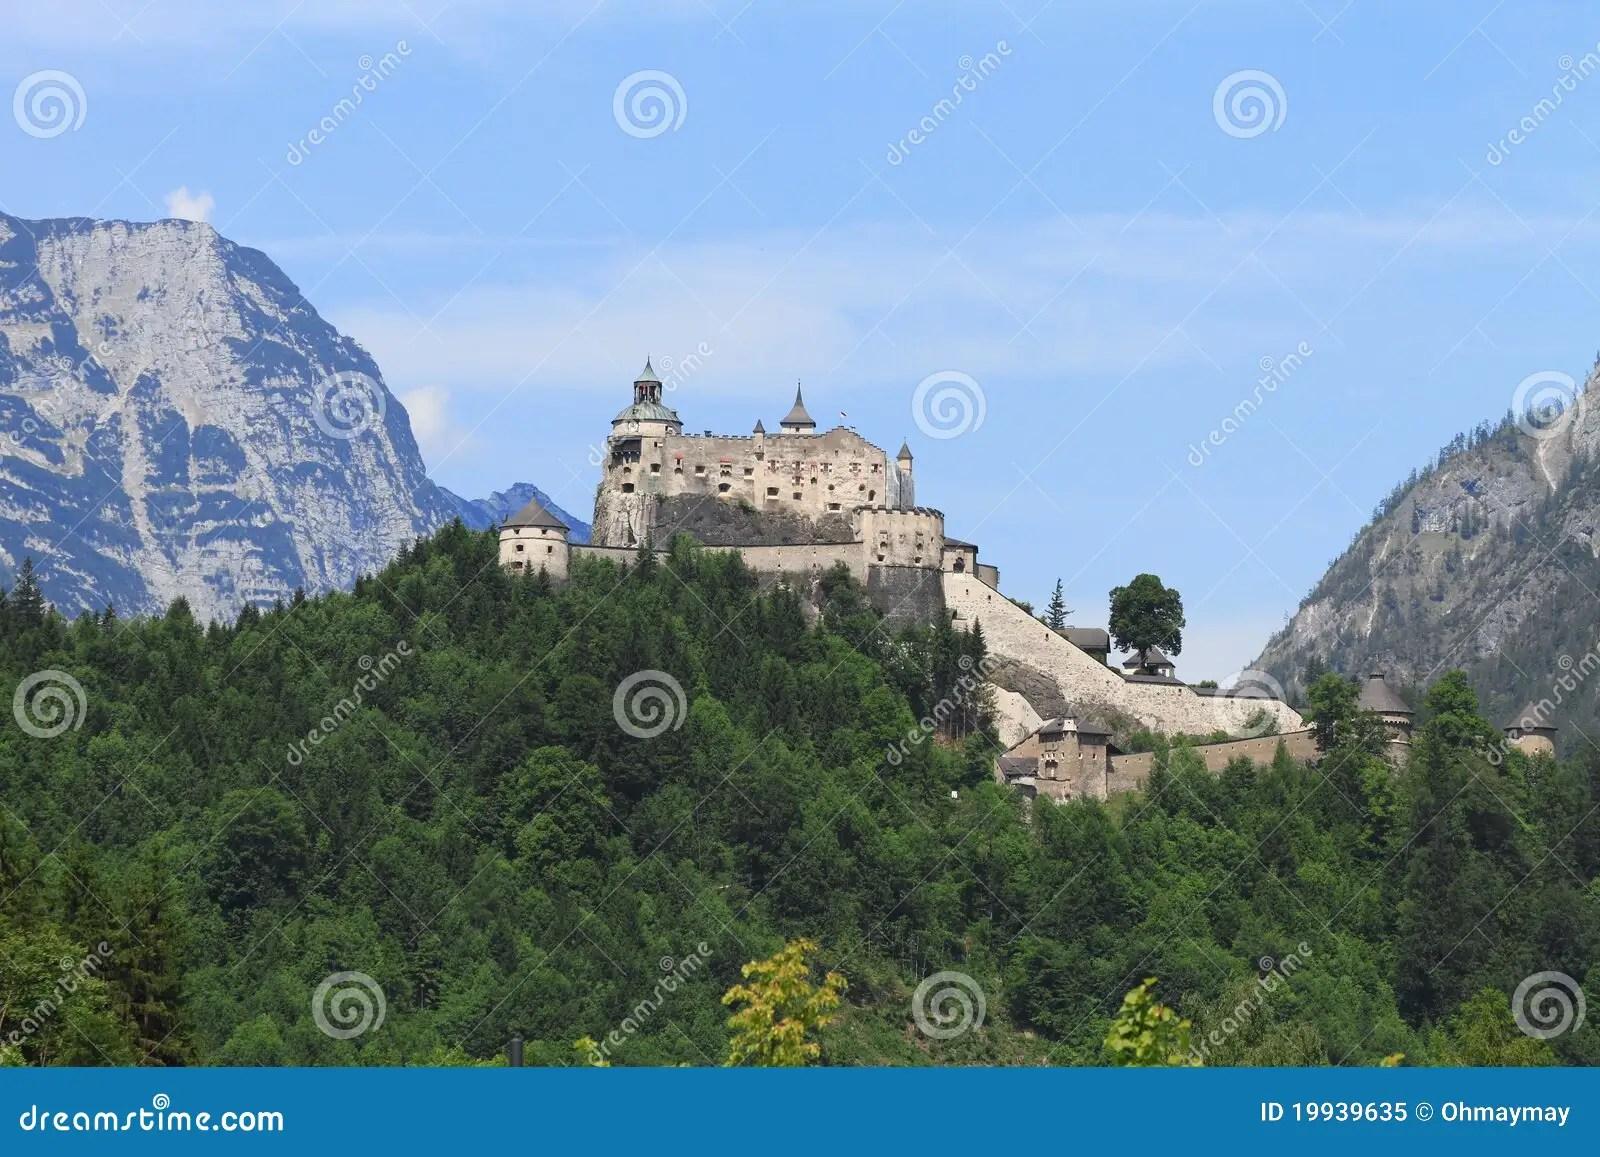 Werfen Castle Austria stock image Image of eastern  19939635